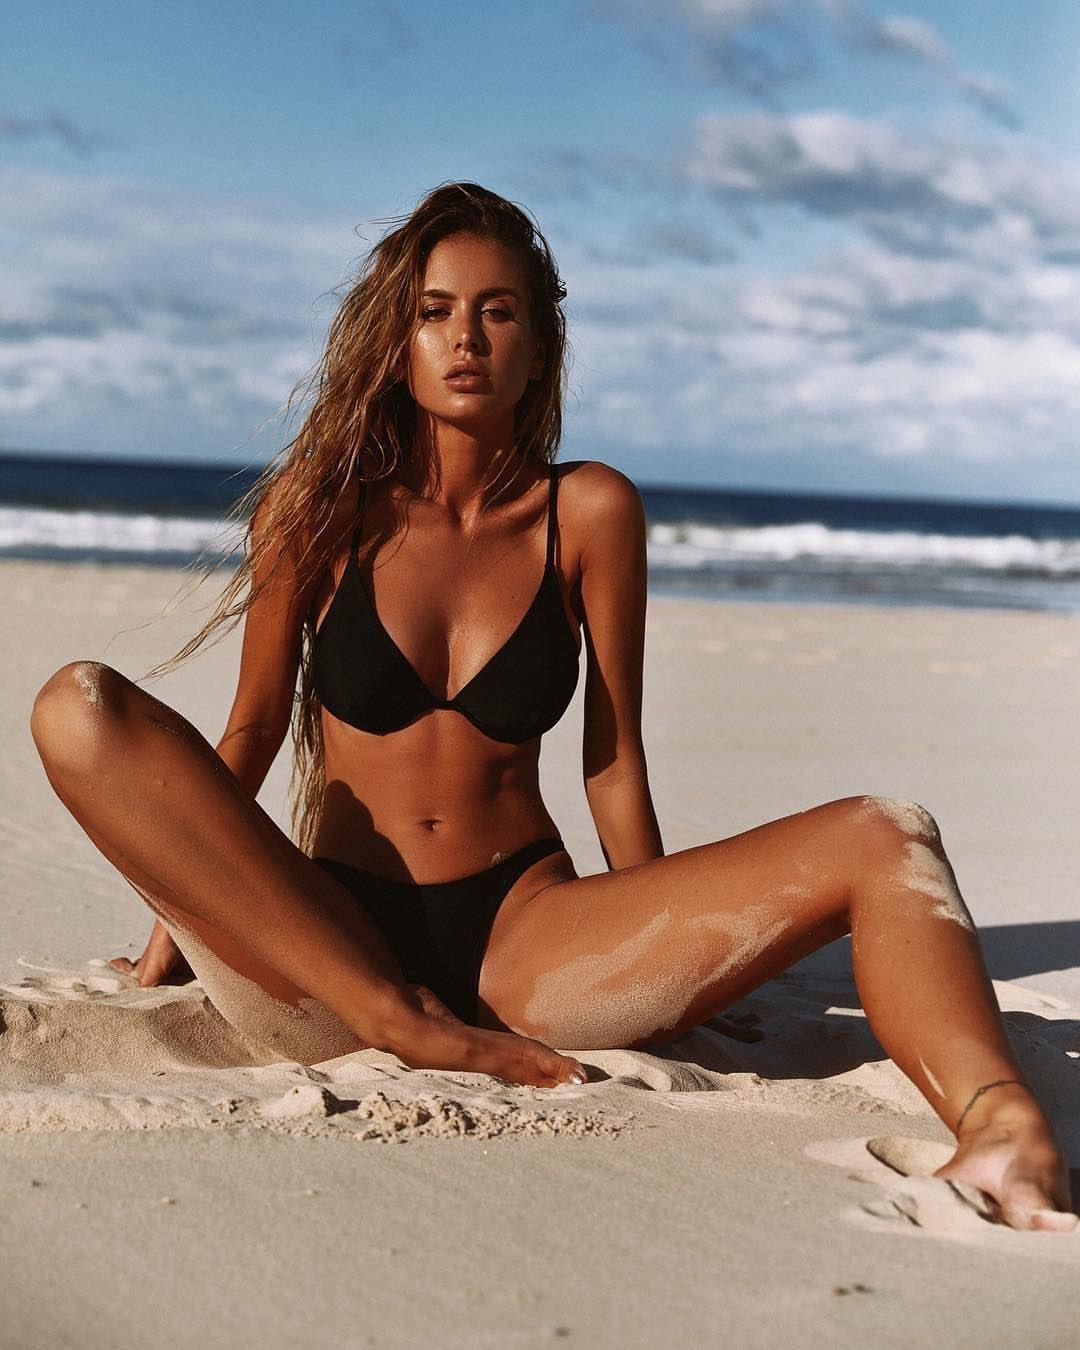 Beach Babe Bikini In Milk